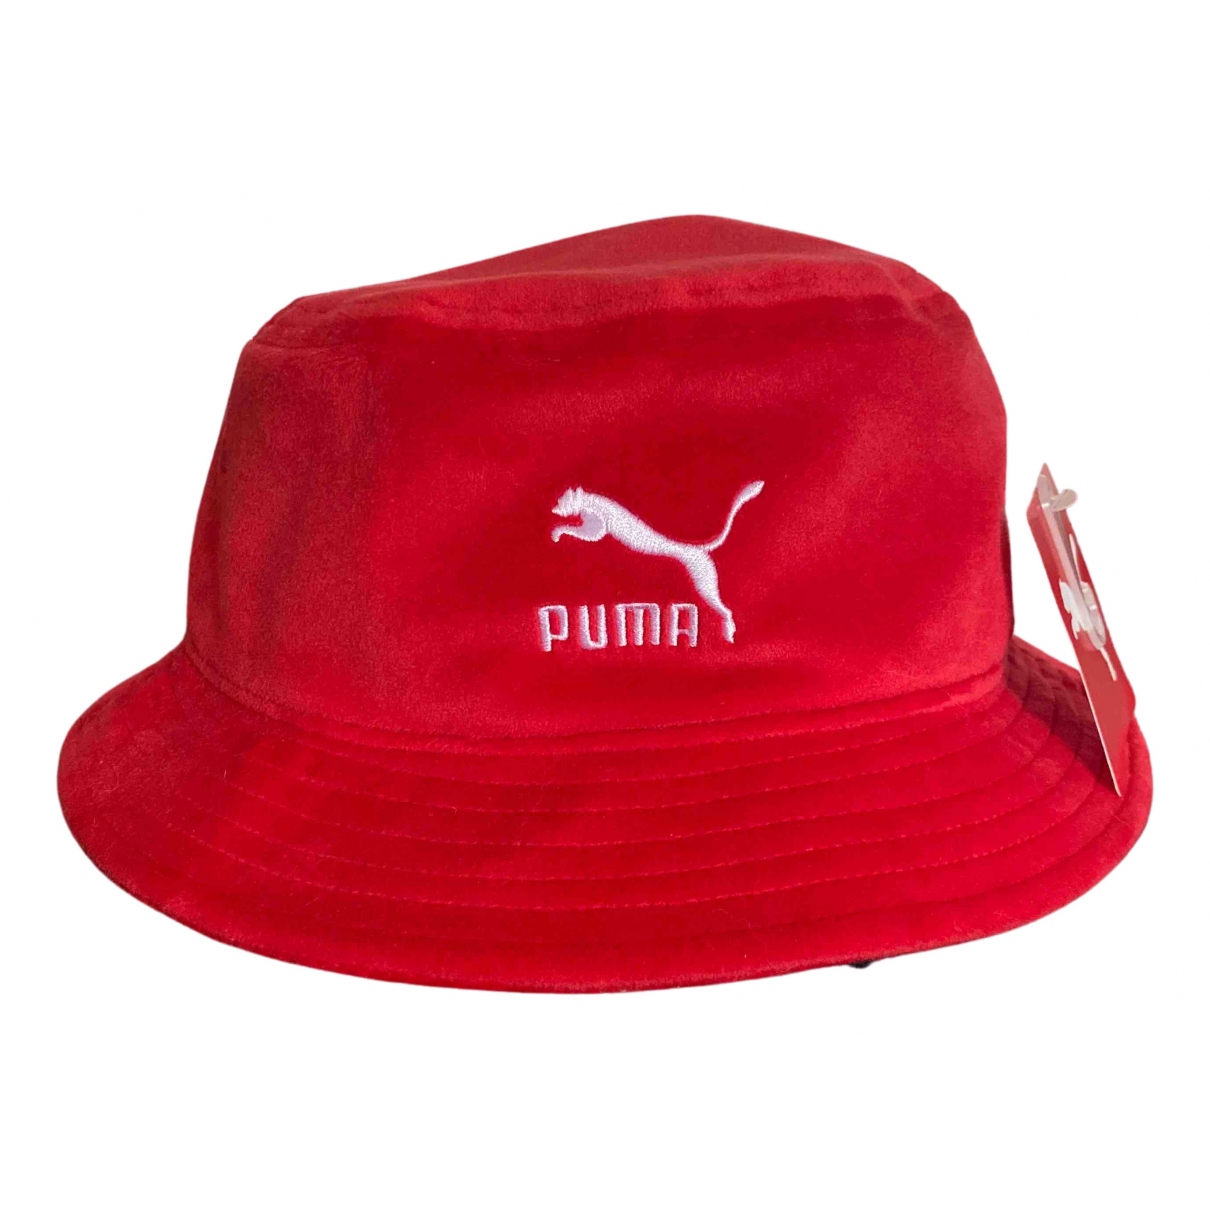 Puma N Red Suede hat for Women M International